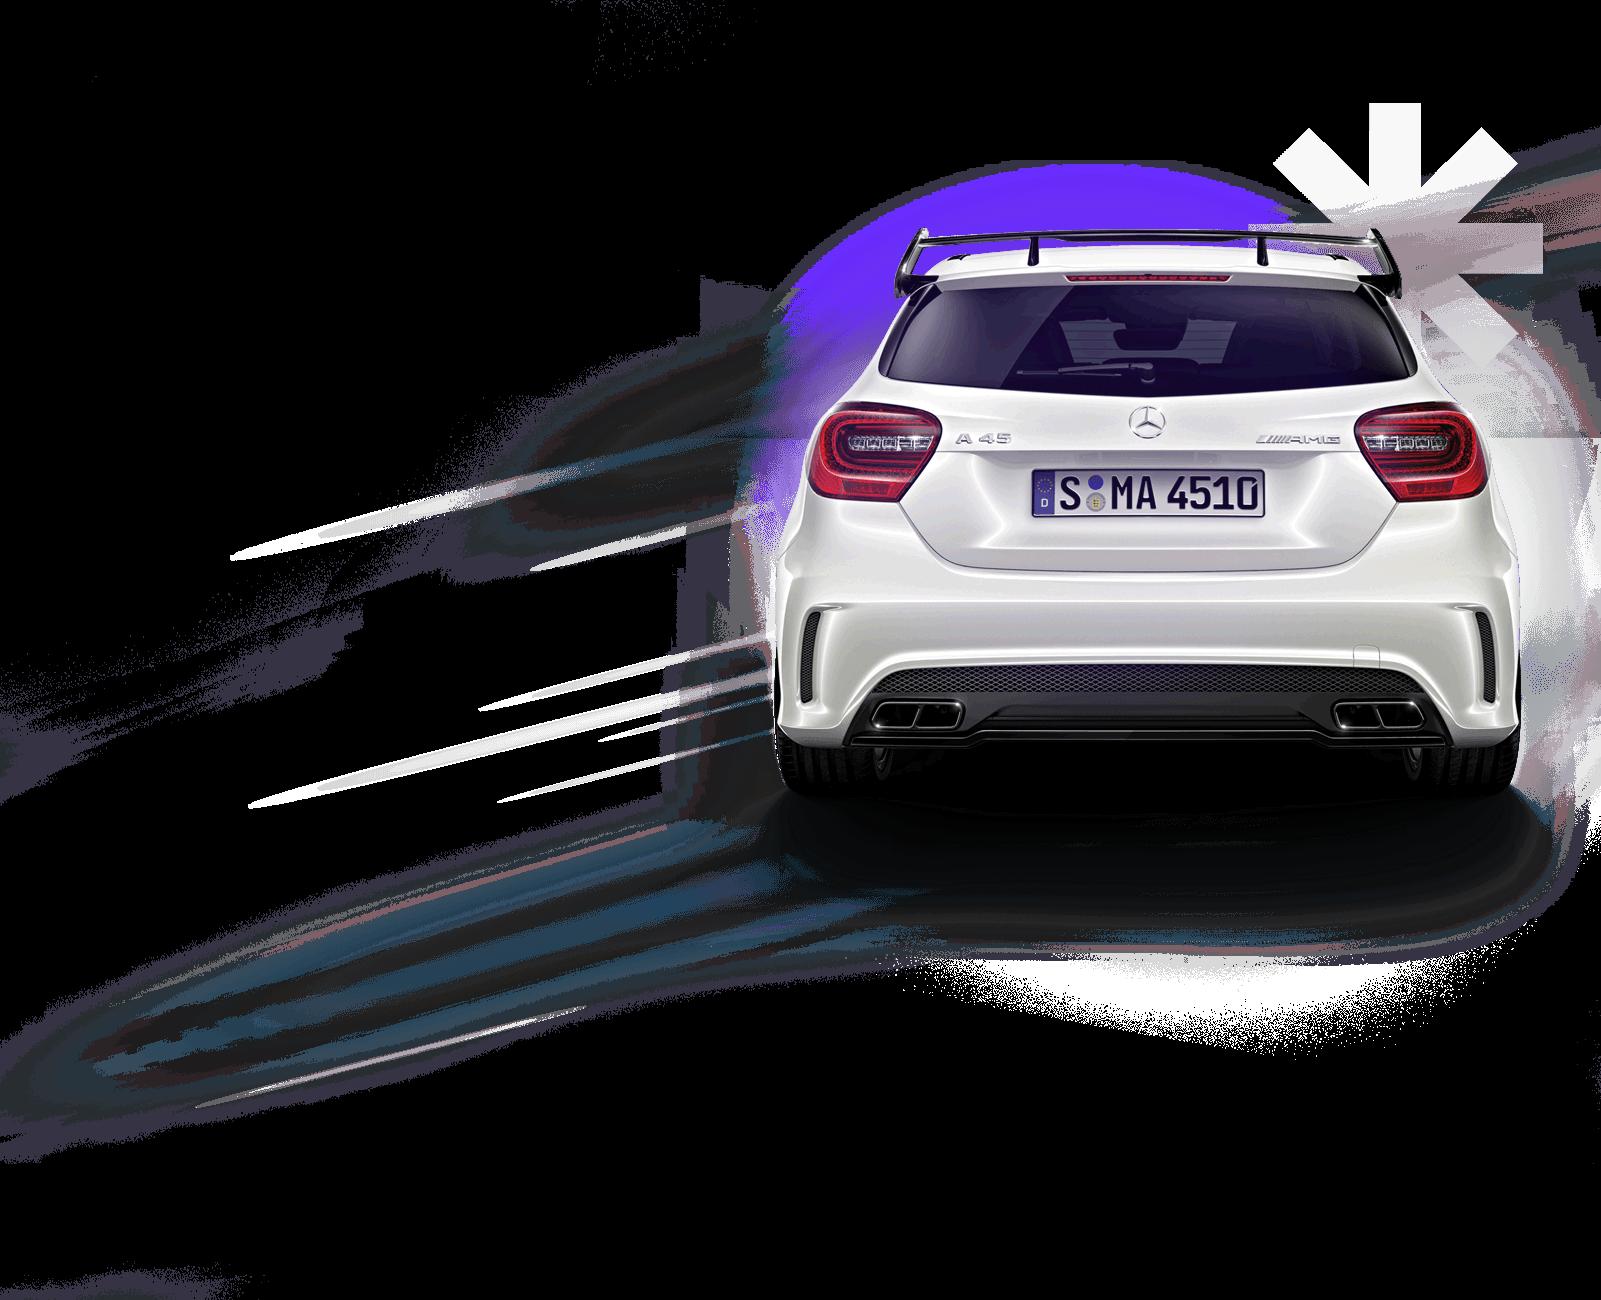 Download Mercedes Car Png Image HQ PNG Image.